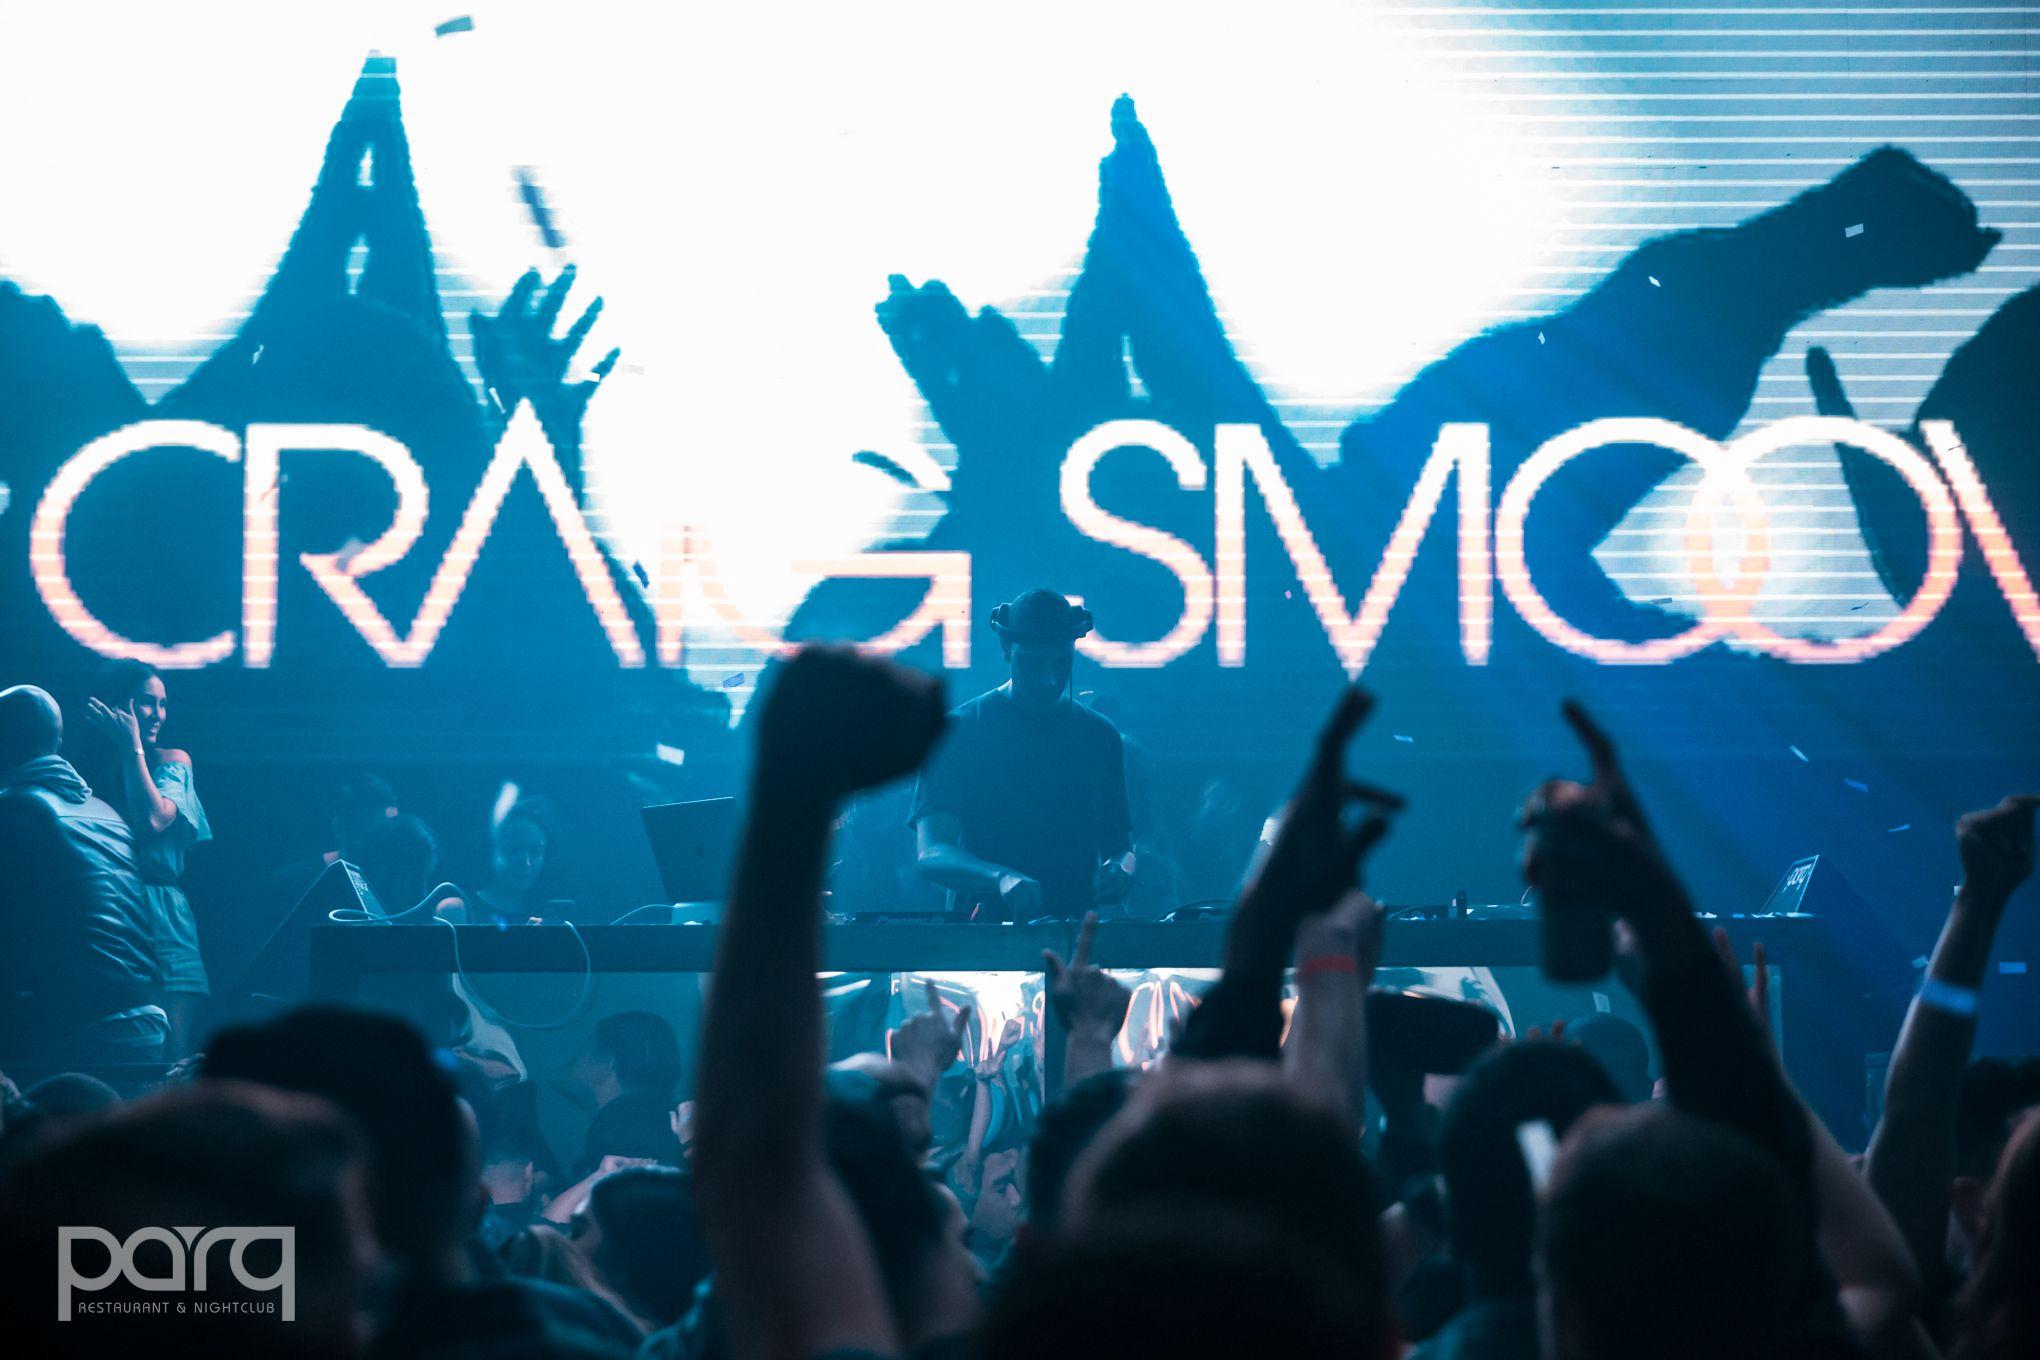 05.03.19 Parq - Craig Smoove-16.jpg